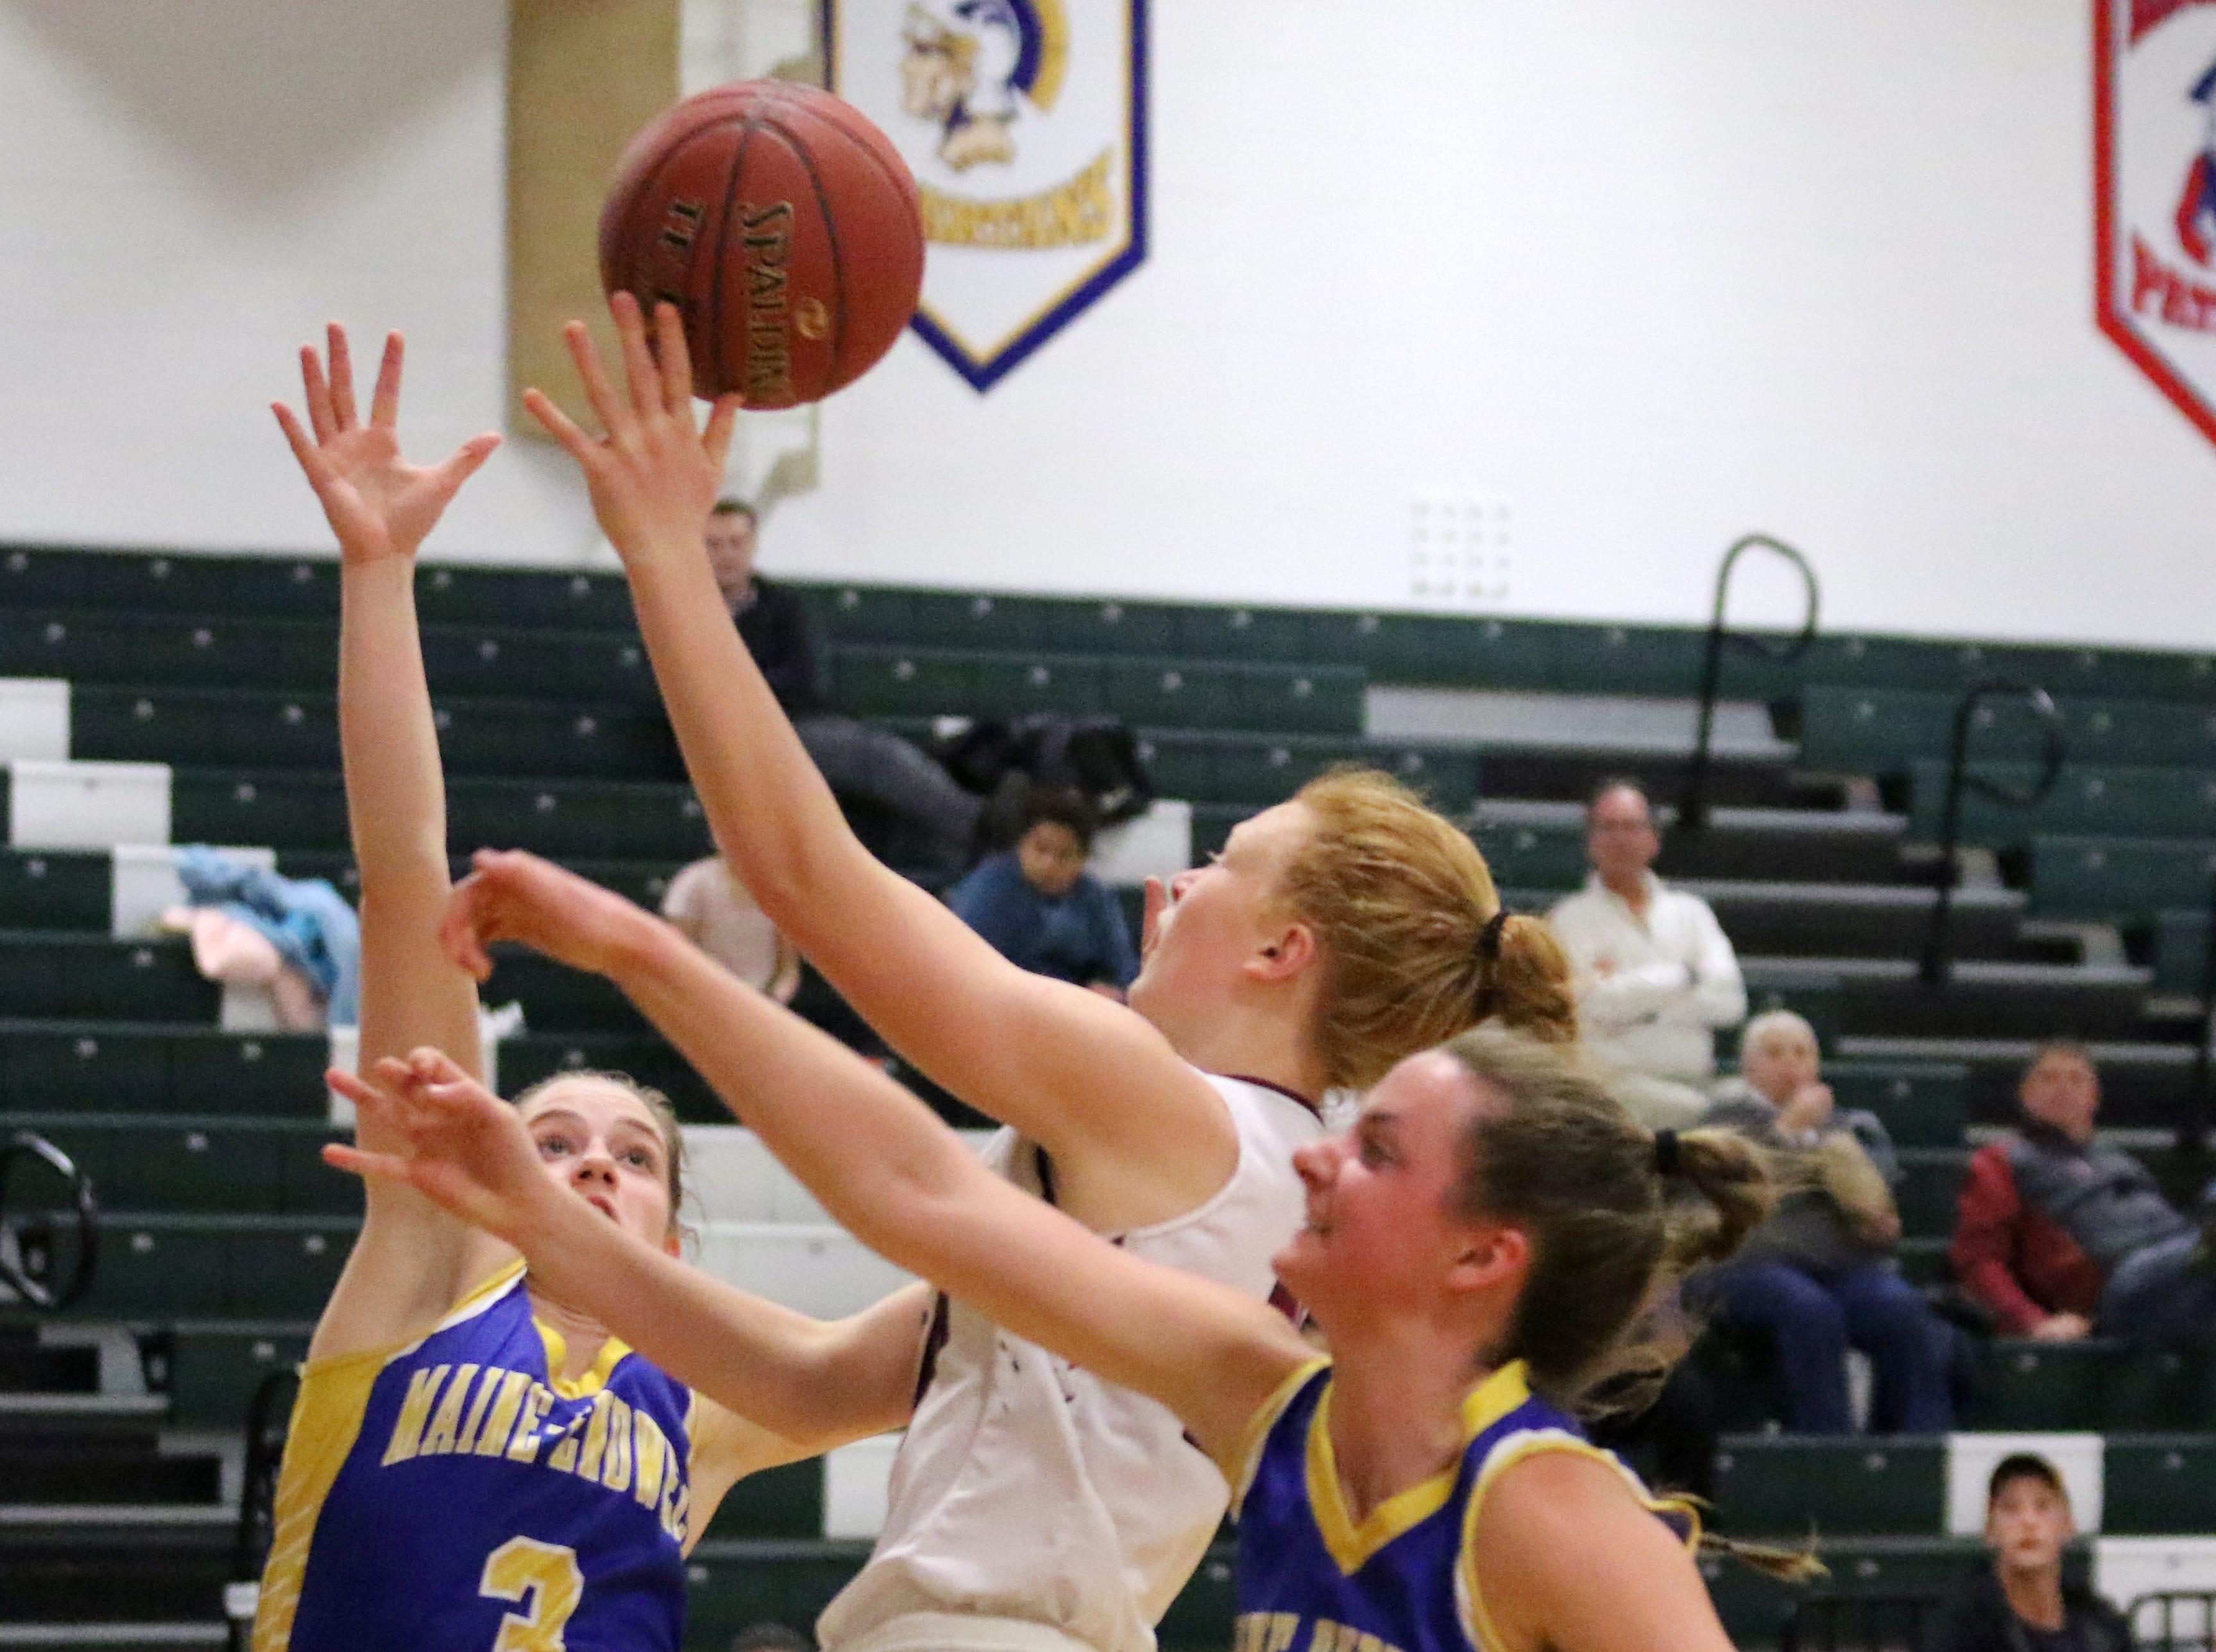 Action from the Elmira girls basketball team's 57-55 win over Maine-Endwell on Jan. 28, 2019 at Elmira High School.